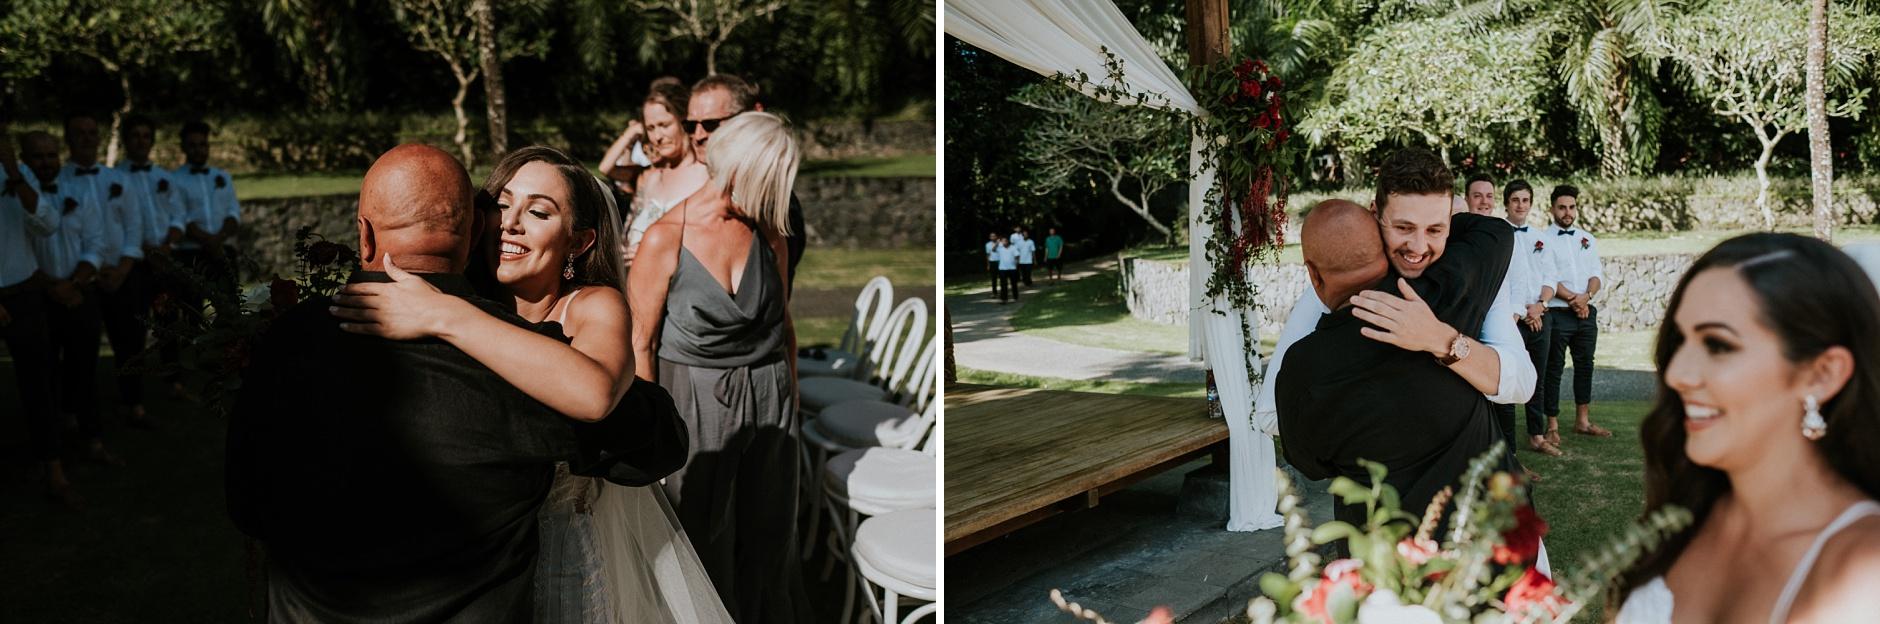 breanna&dan0313a_Bali-Wedding-Photographer.jpg